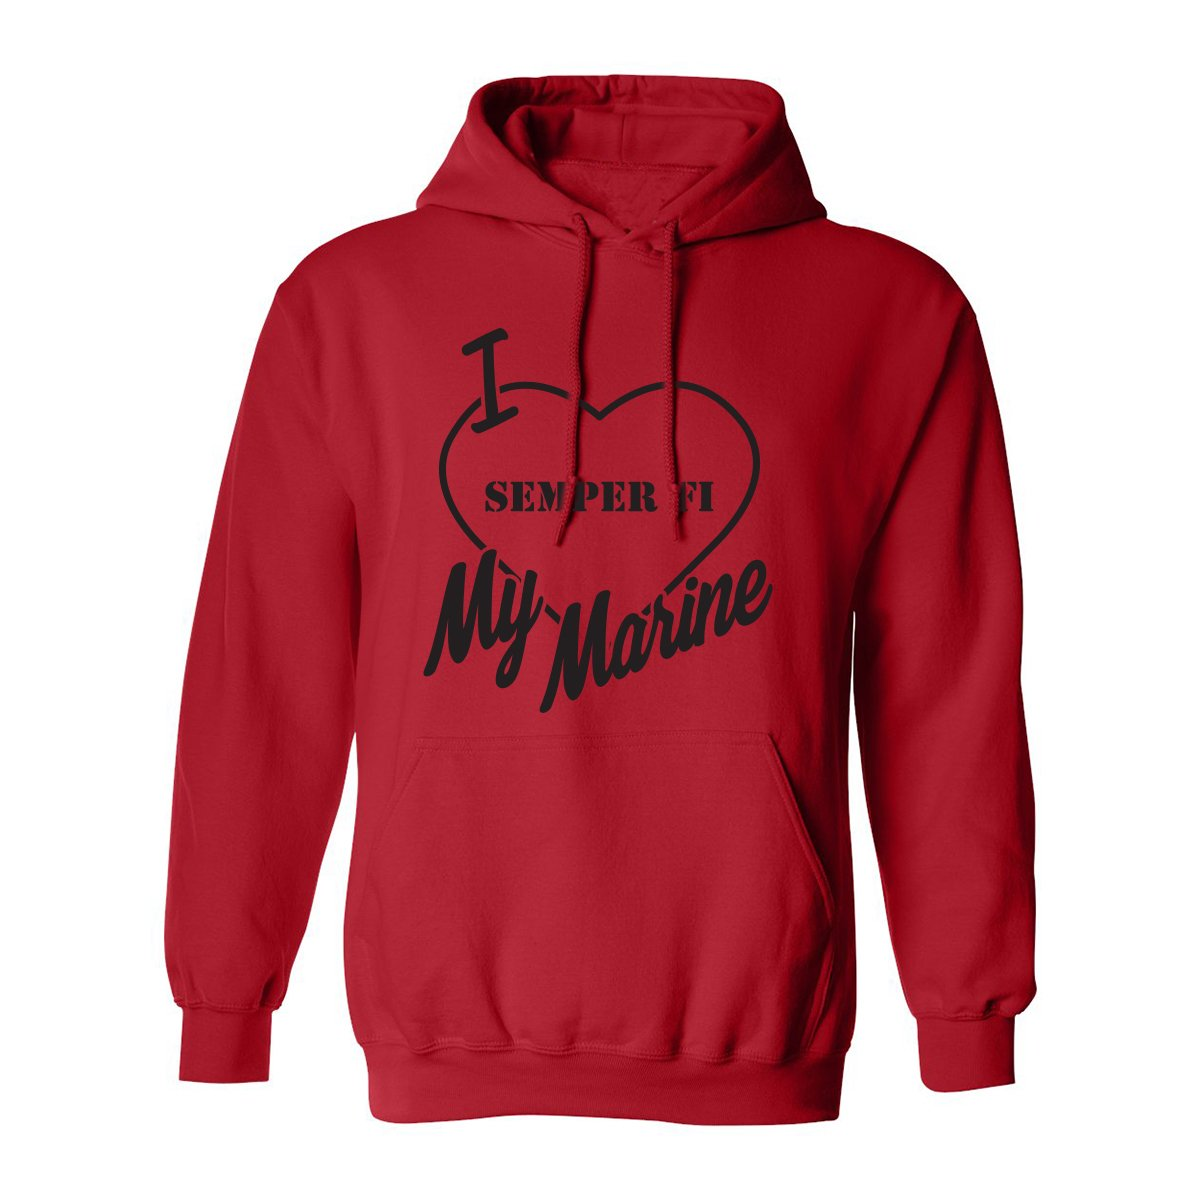 I Love My Marine (Semper fi) Adult Hooded Sweatshirt in Red - XXXX-Large